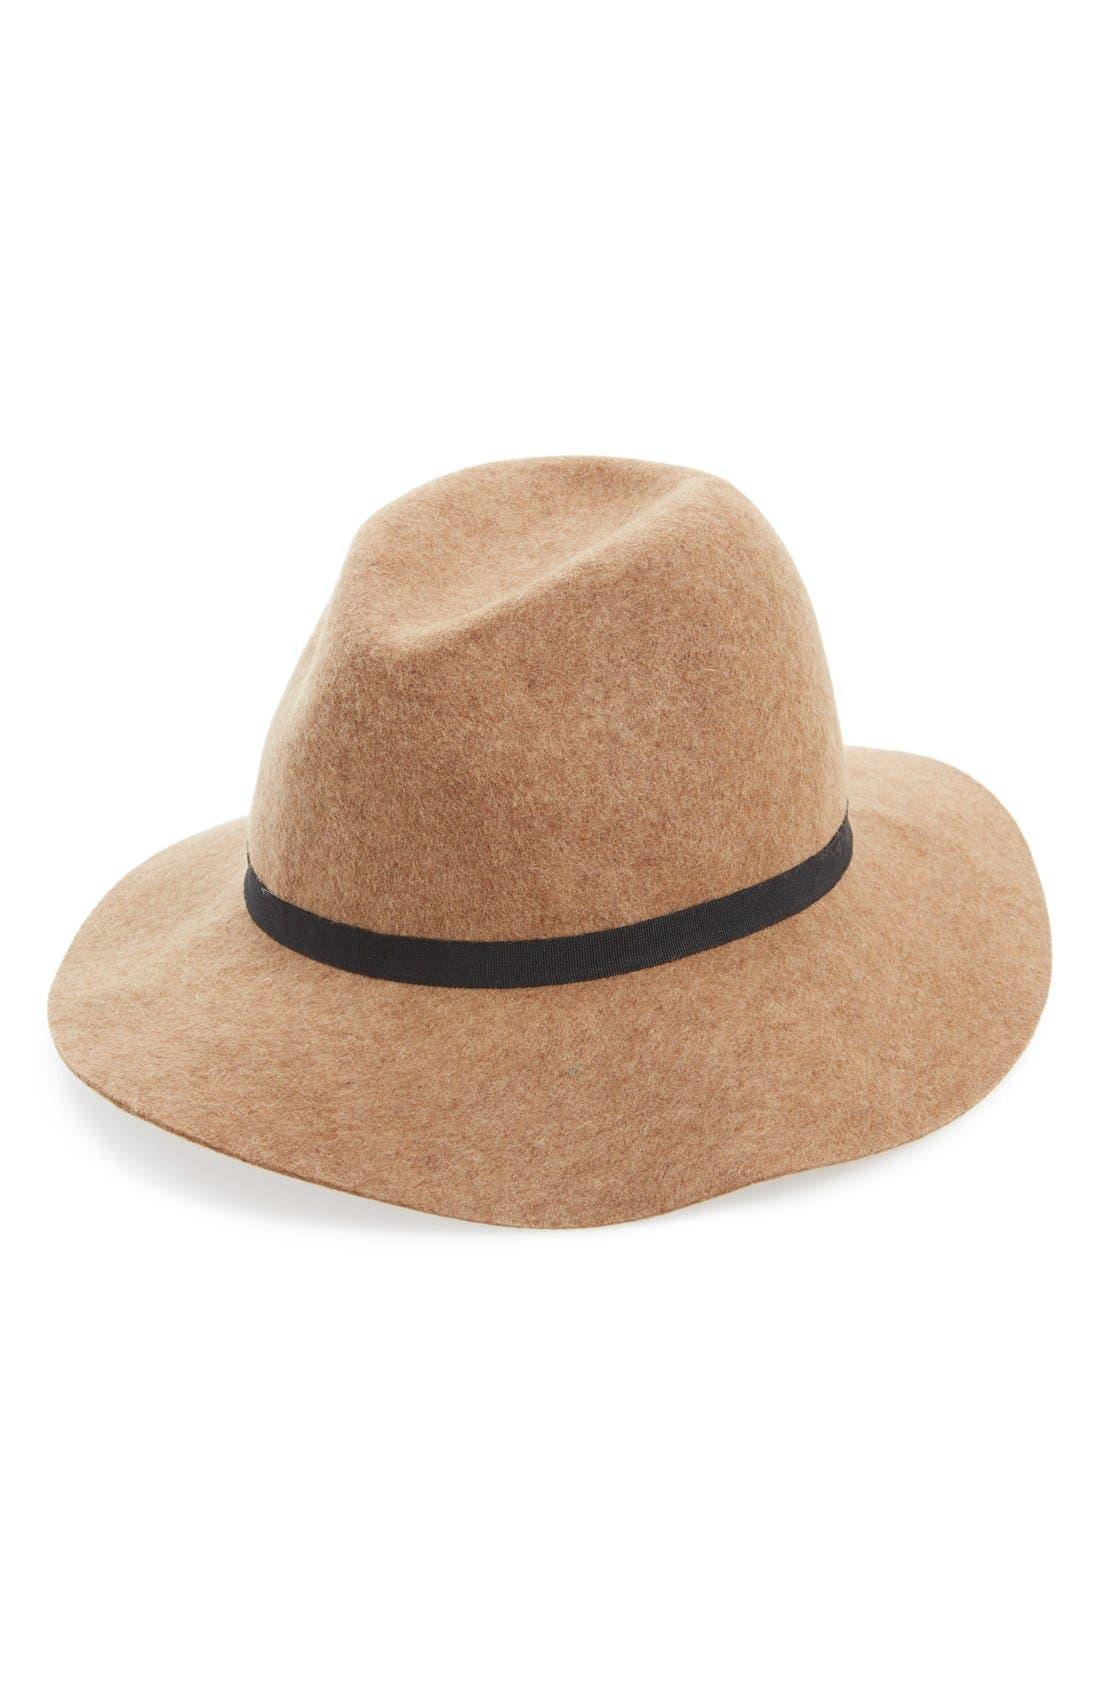 Alternate Image 1 Selected - Hinge Wool Felt Panama Hat